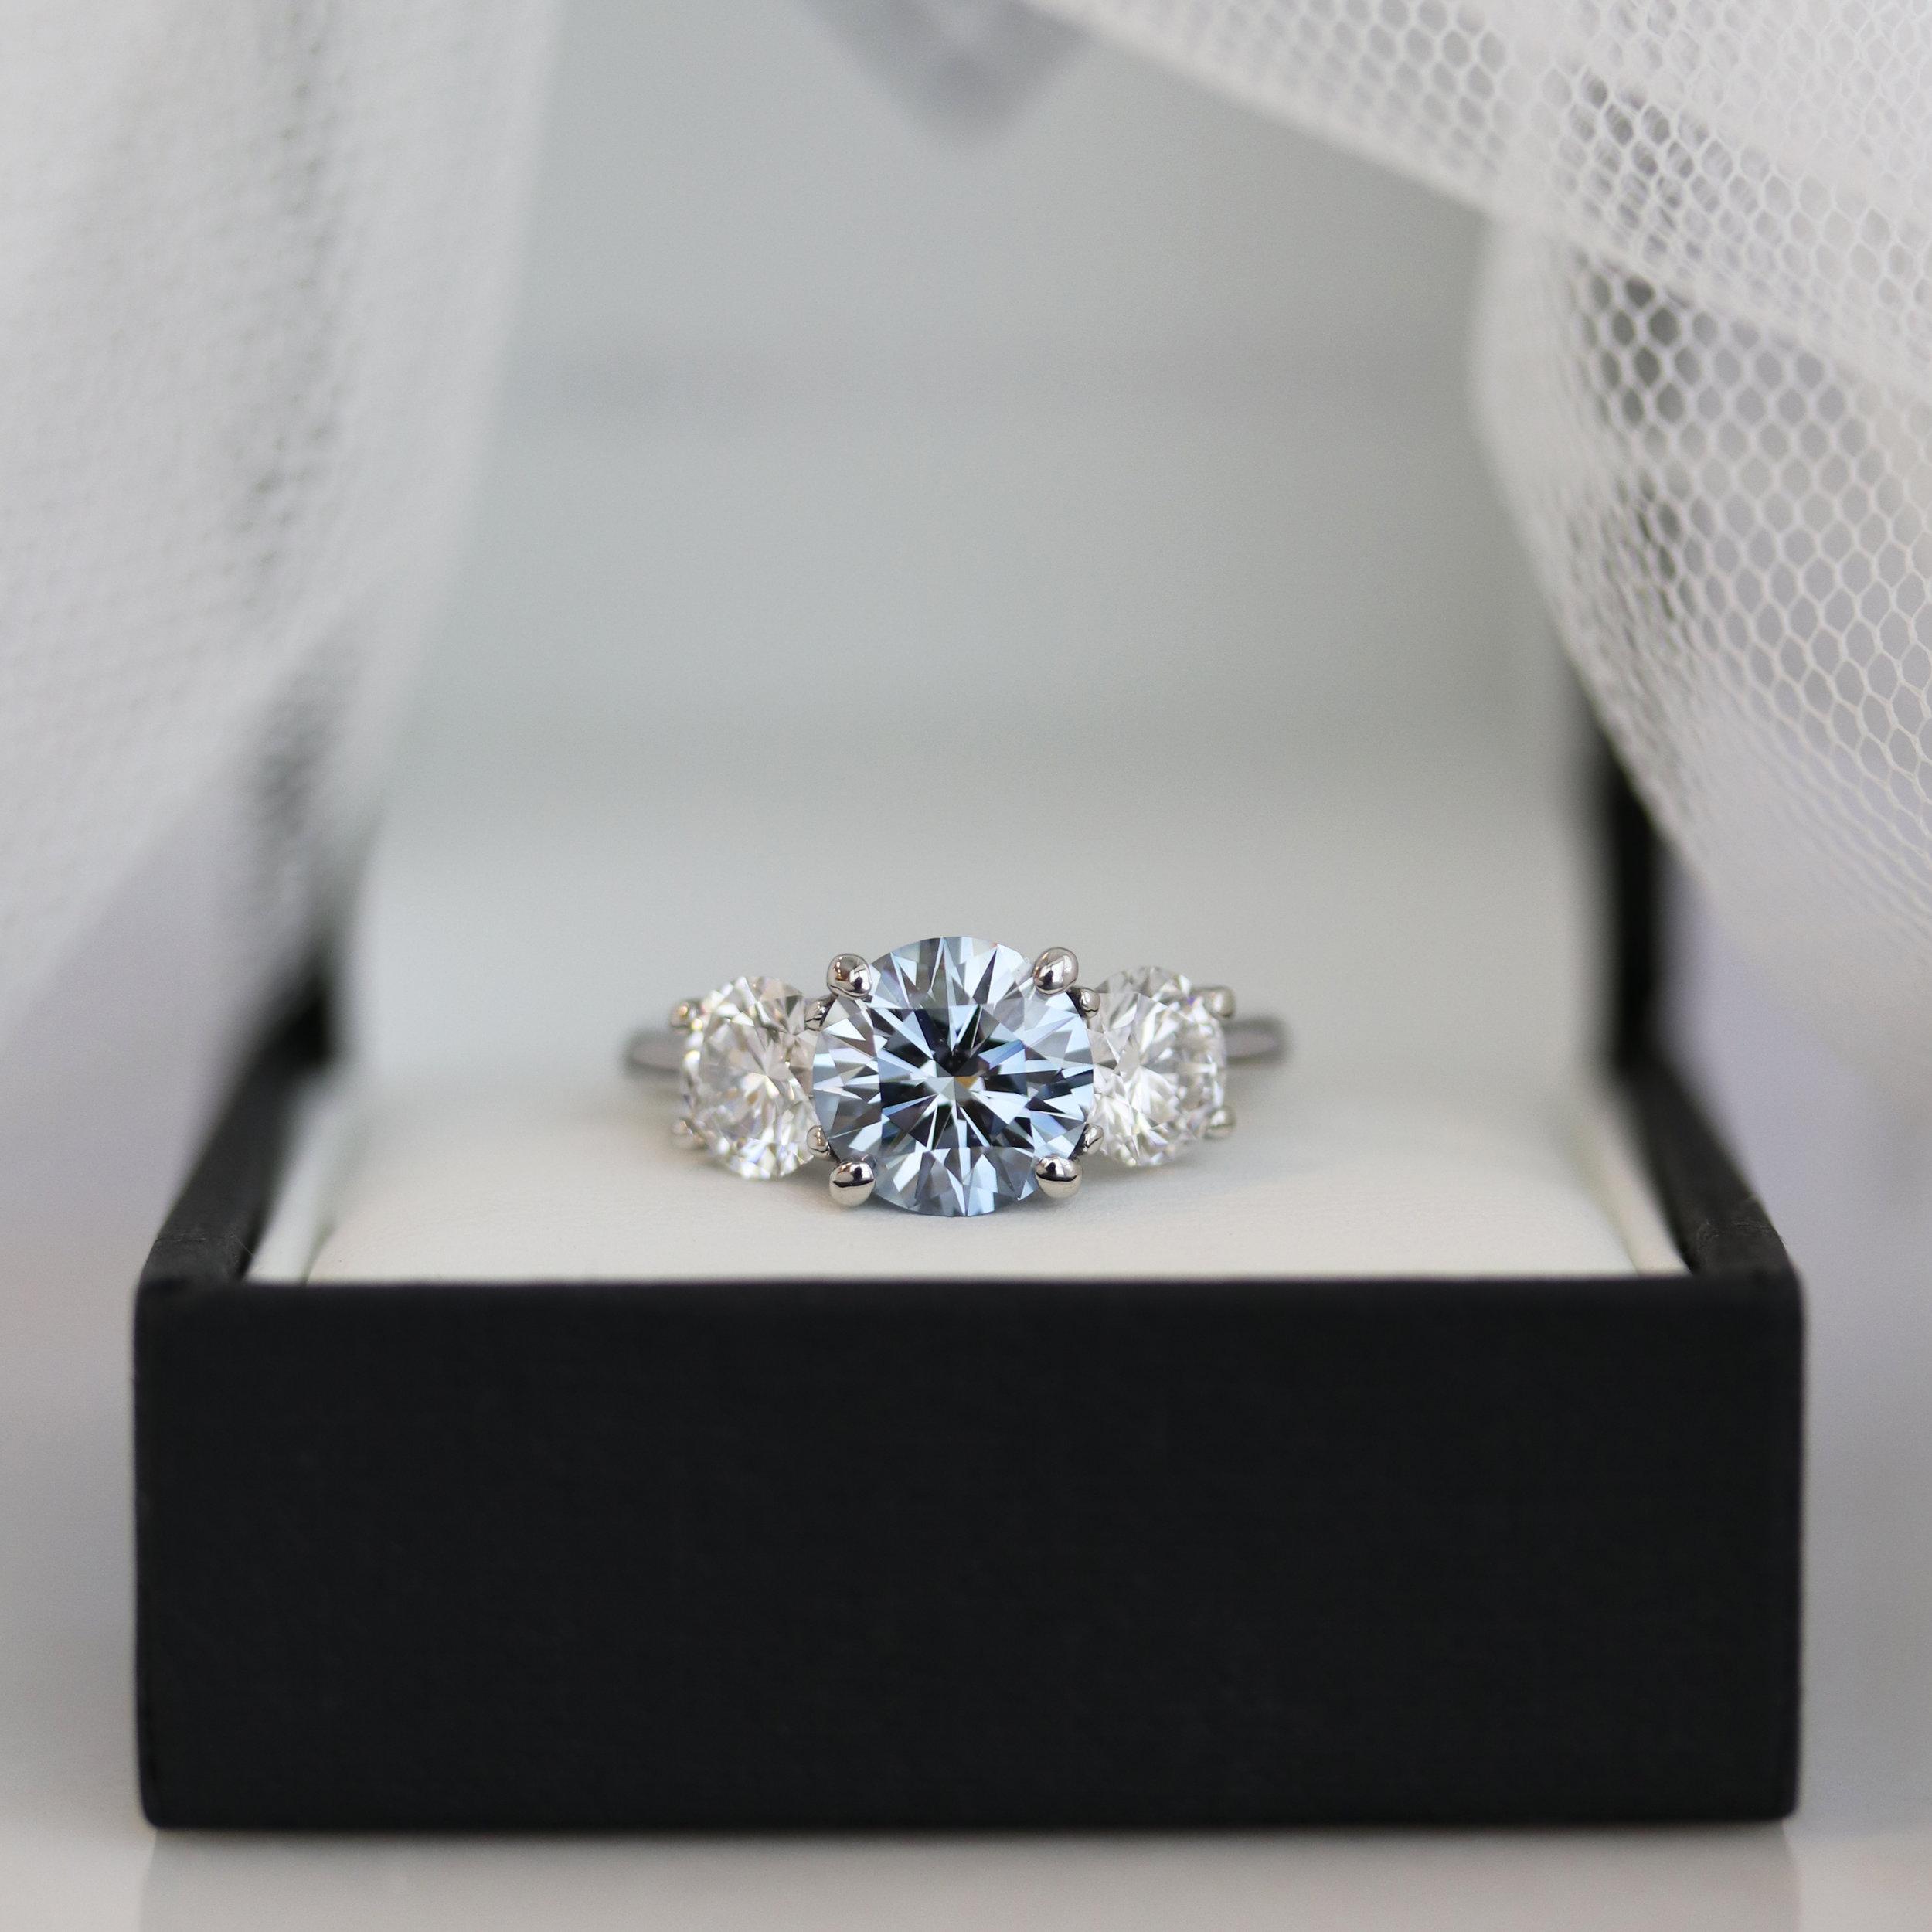 Three Stone Ring with blue diamond center